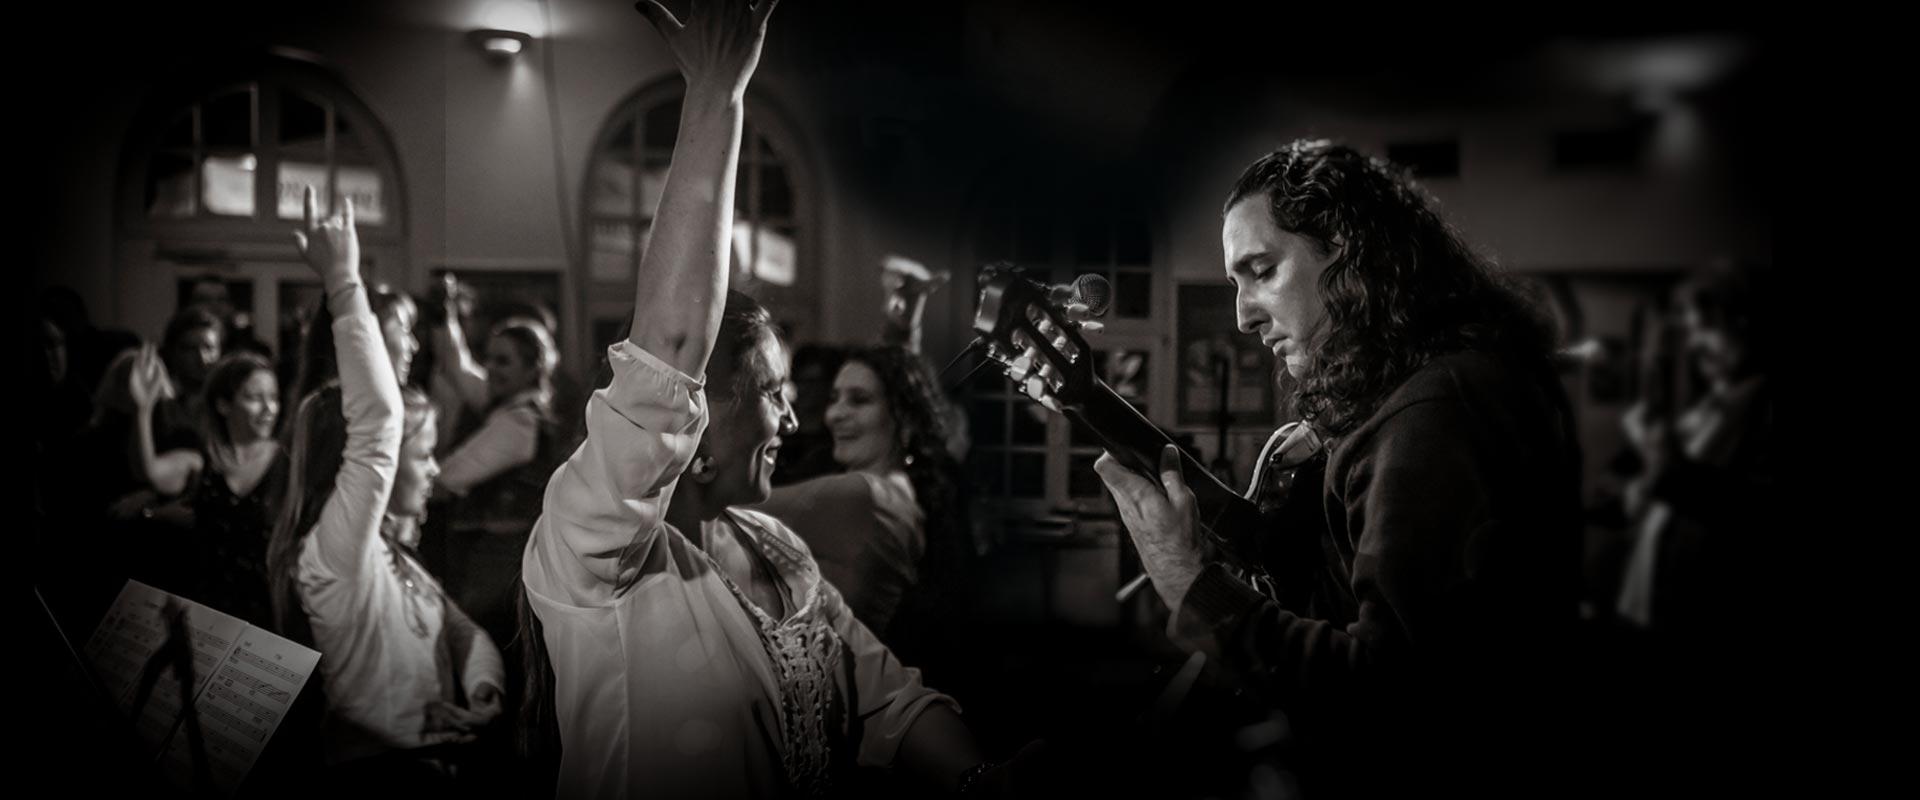 La Noche Flamenca 2016 in der Sol Kulturbar